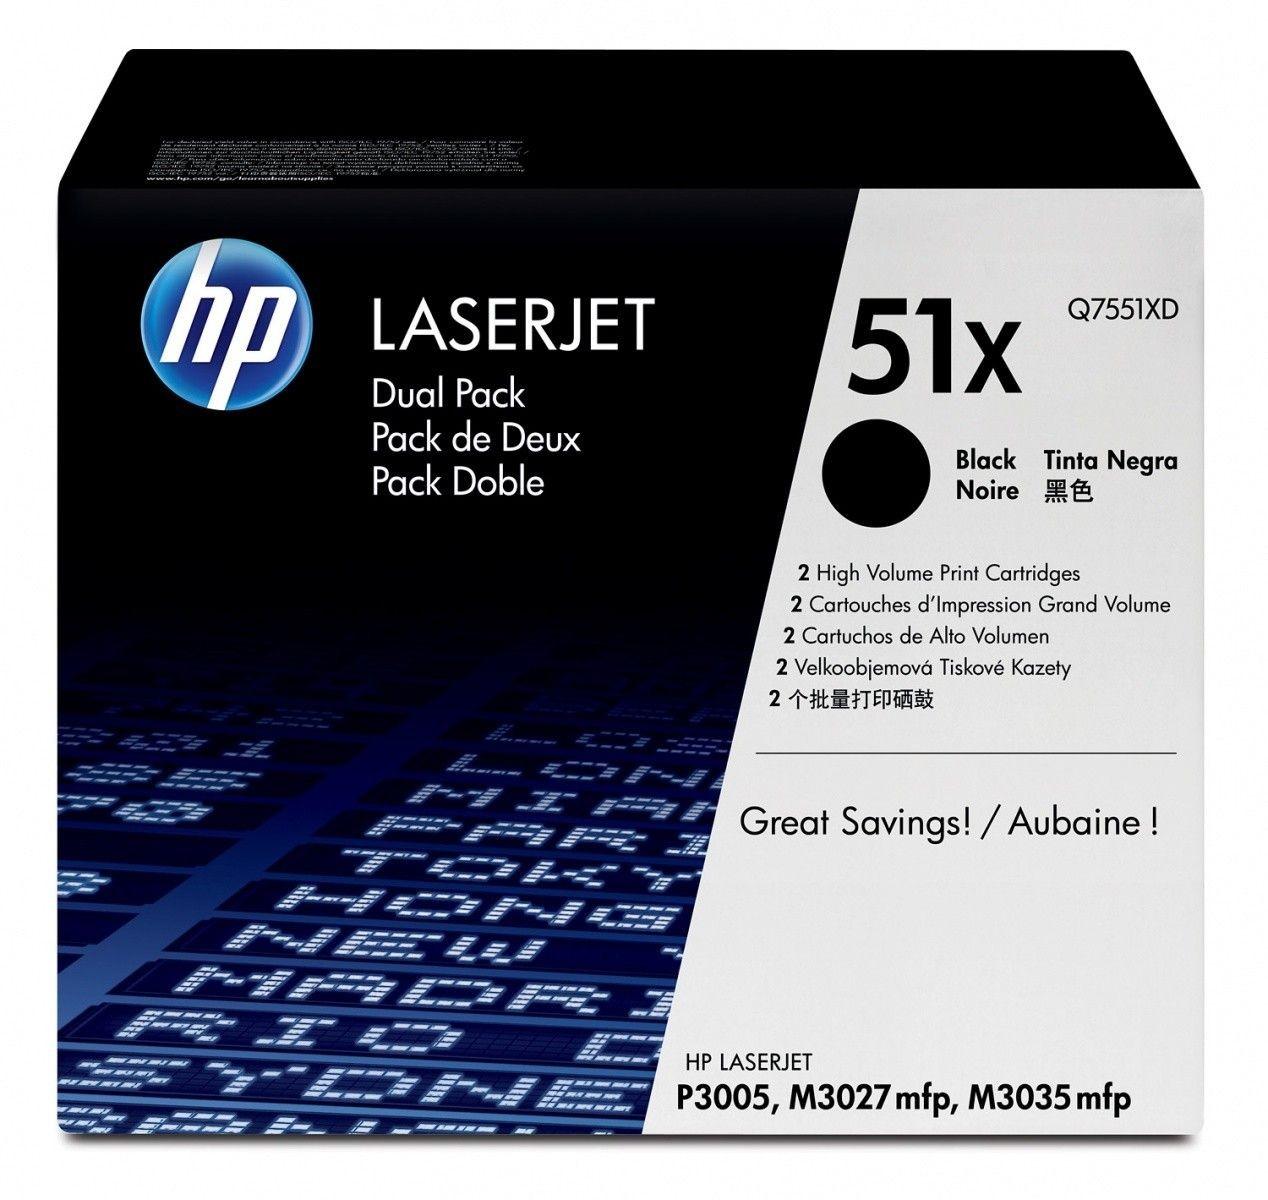 HP toner black dual pack (13000str, LJP3005/M3035MFP/M3027MFP)